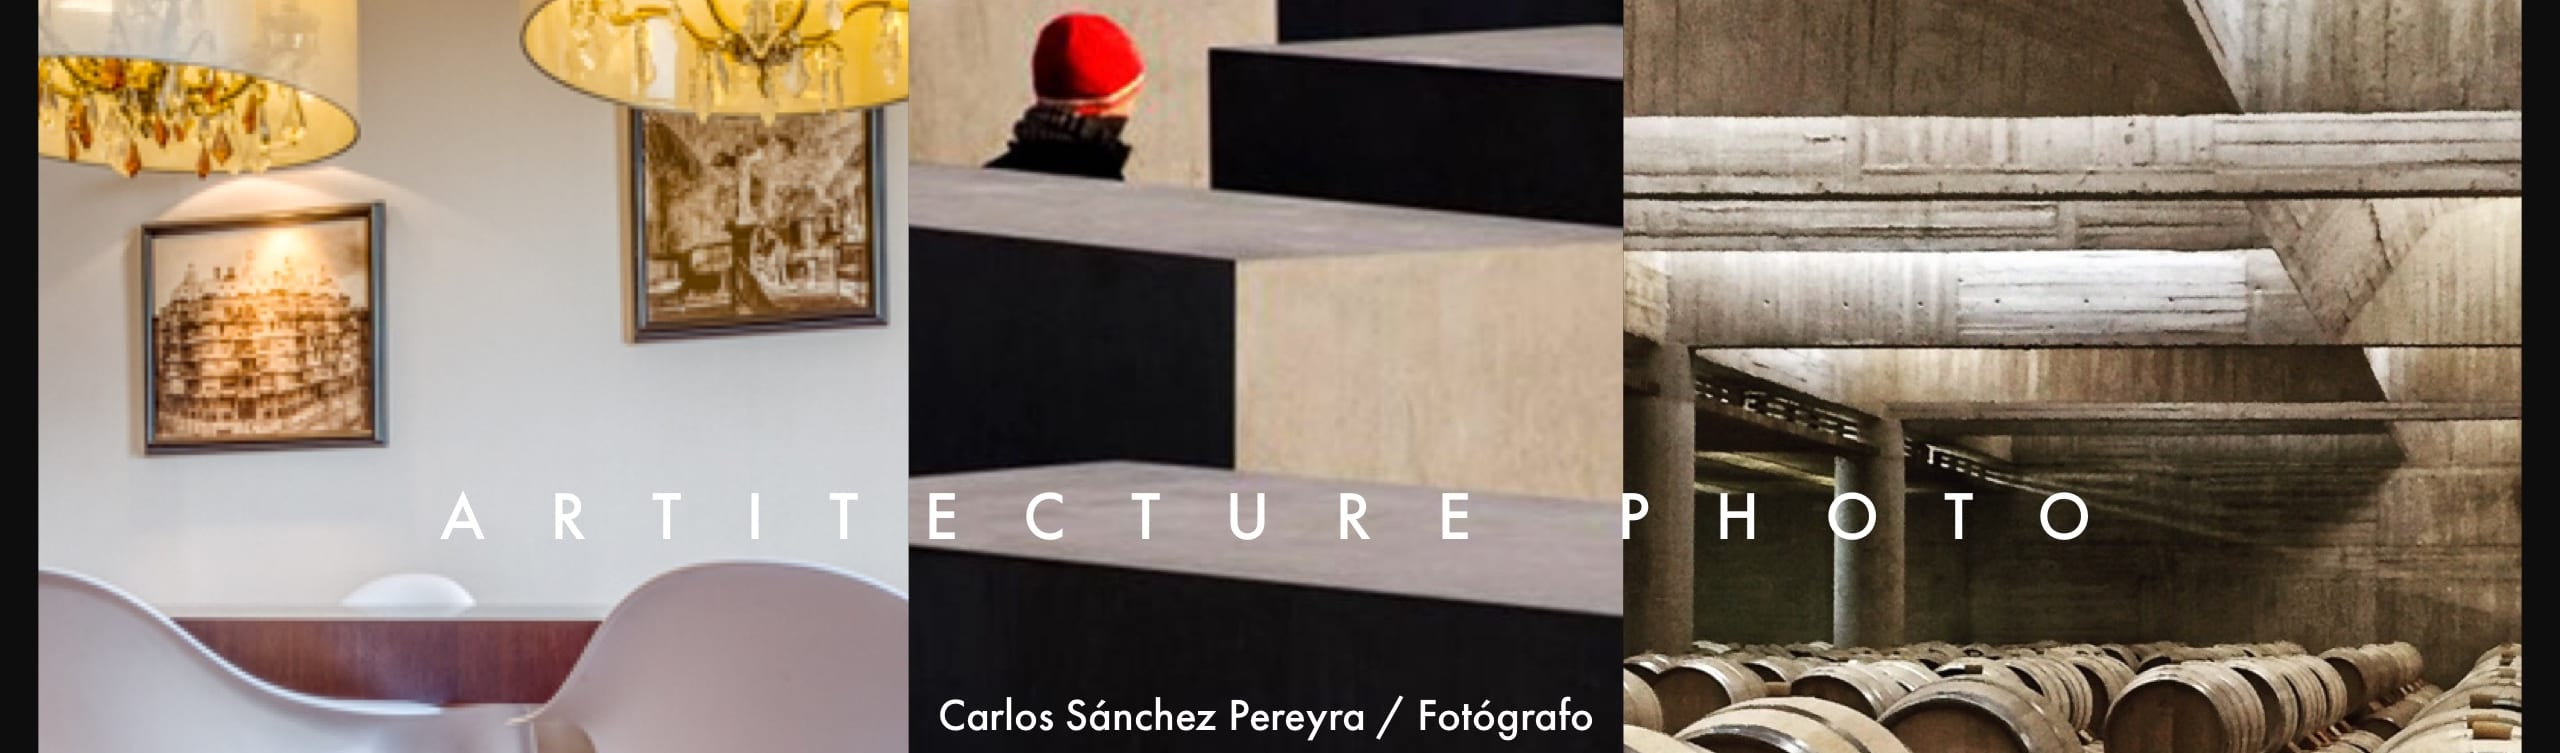 Carlos Sánchez Pereyra | Artitecture Photo | Fotógrafo